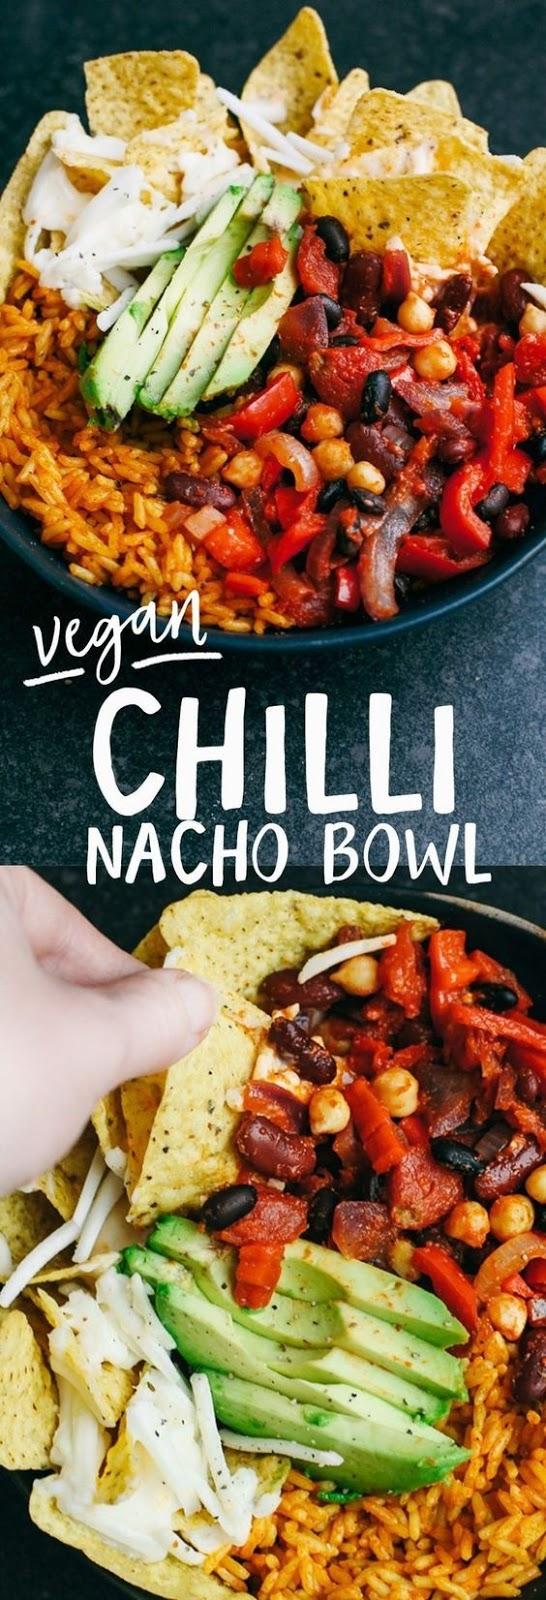 Vegan Chilli Cheese Nachos